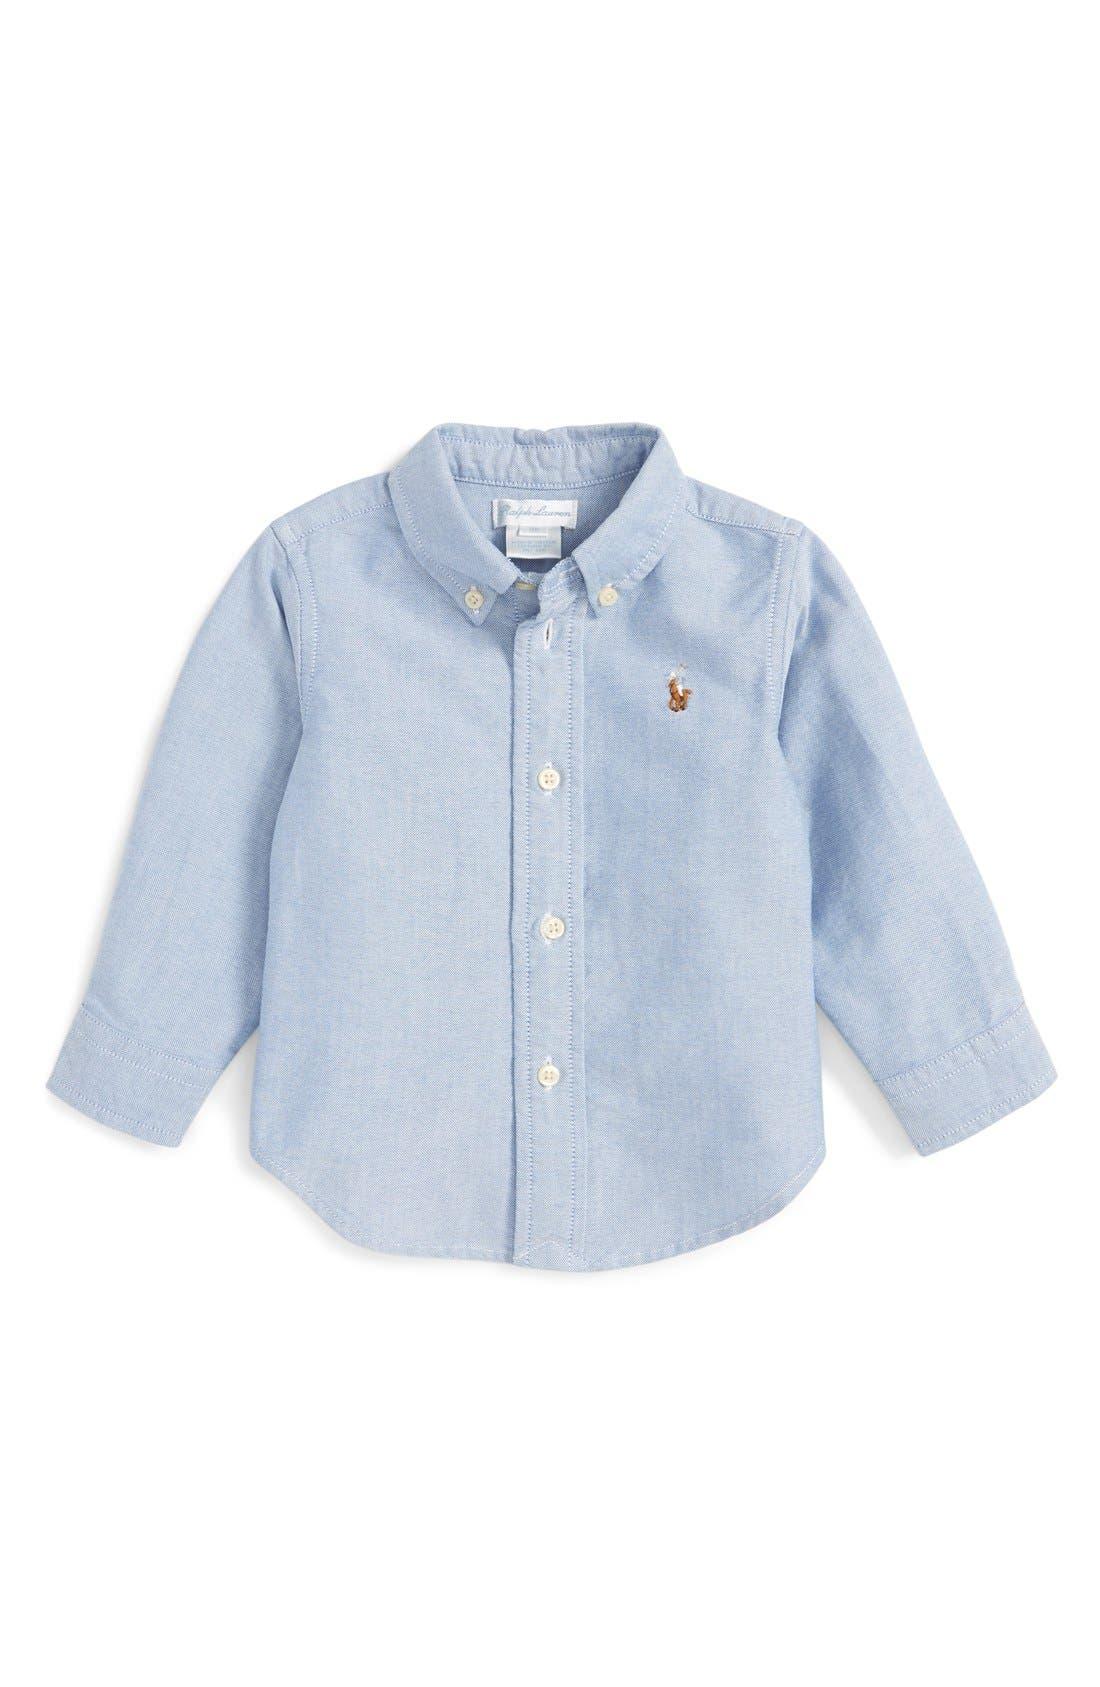 Oxford Shirt,                         Main,                         color, Oxford Blue